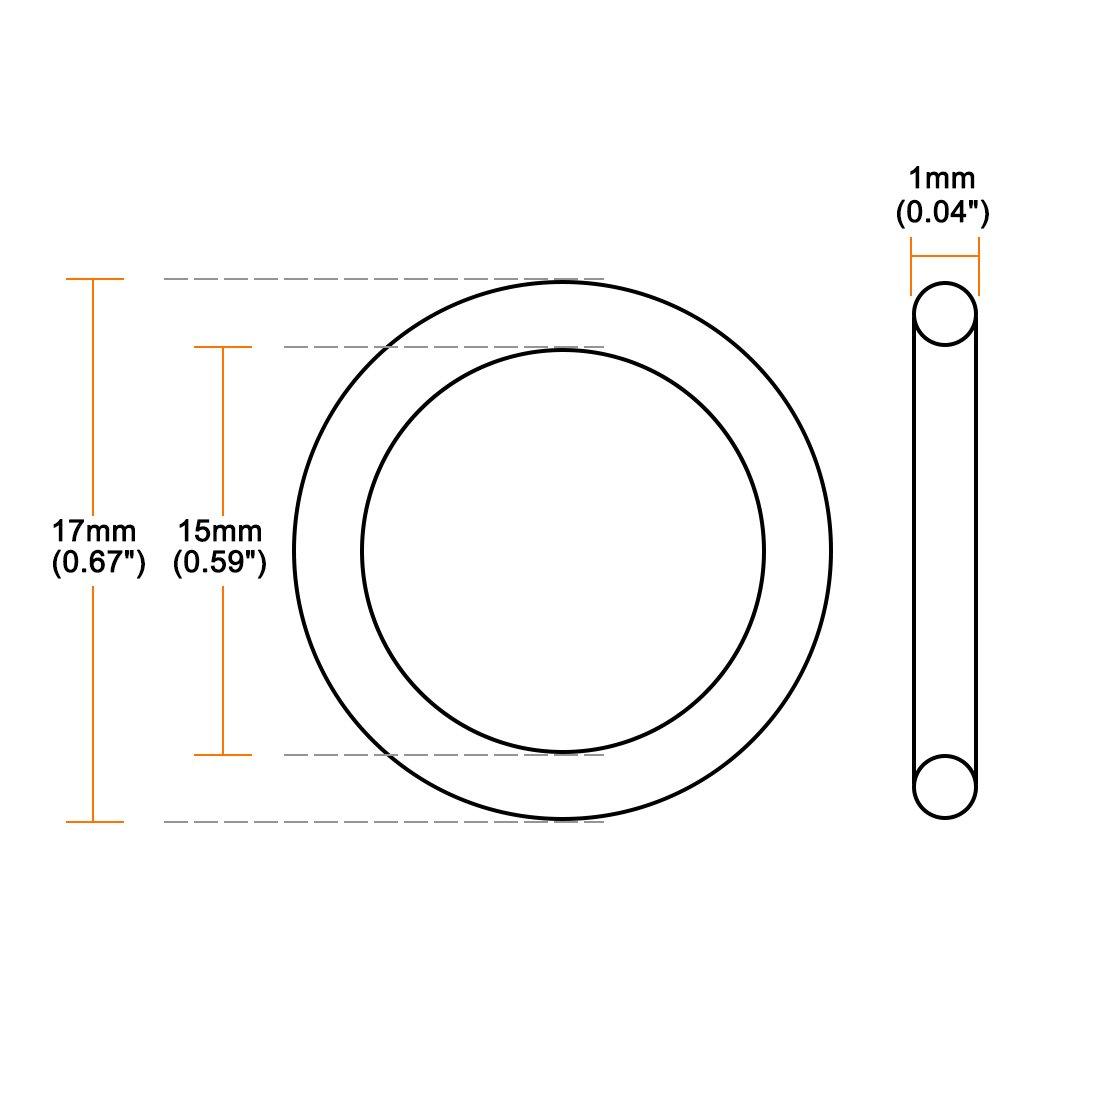 sourcing map 20pcs O-Ringe Nitrilkautschuk Gummi 7mm x 9mm x 1mm Dichtungsring Dichtung DE de